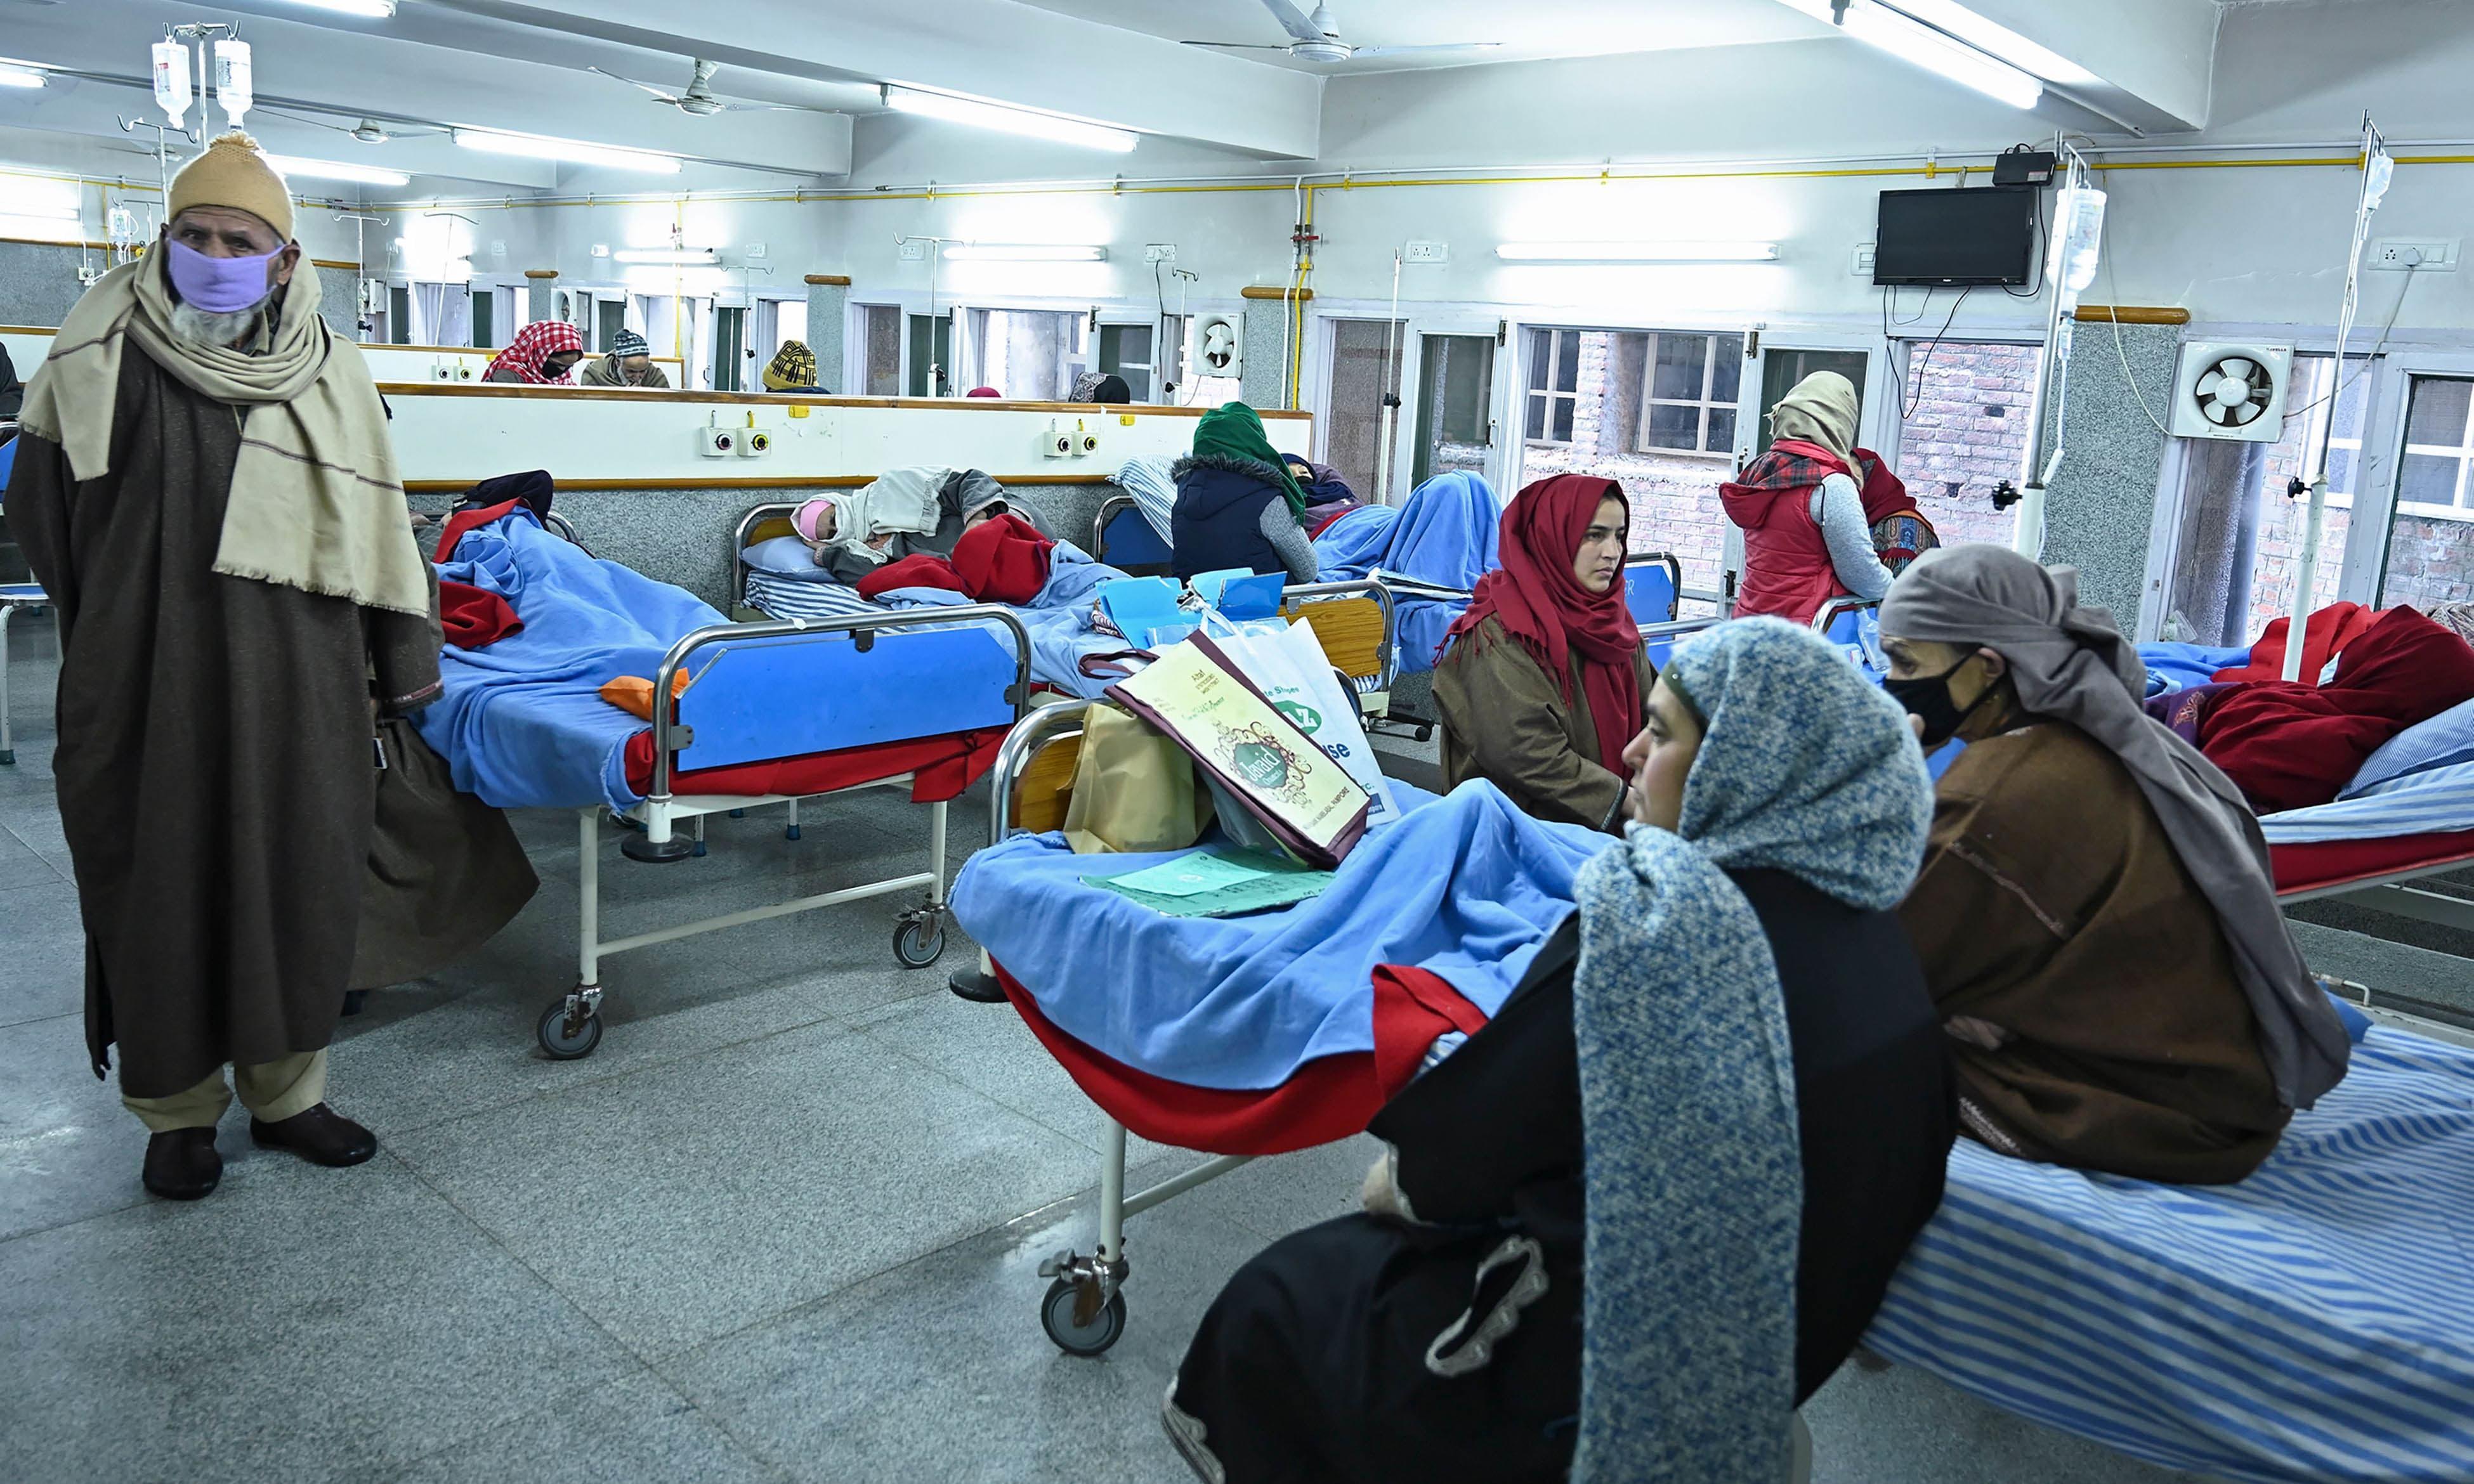 Cancer patients rest inside a hospital ward in Srinagar. — AFP